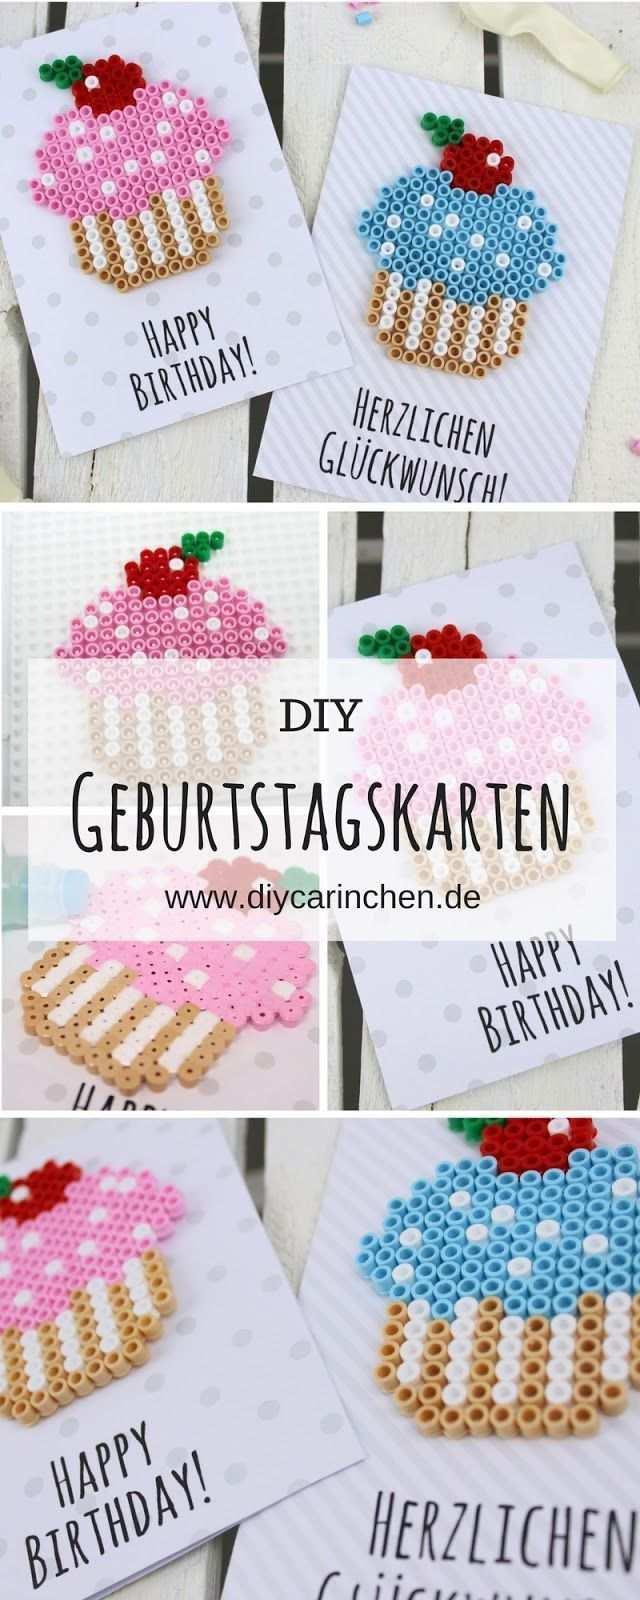 Diy Geburtstagkarten Aus Bugelperlen Selber Machen Geschenkidee Geburtstagskarten Selber Machen Geschenkideen Diy Geschenke Selber Machen